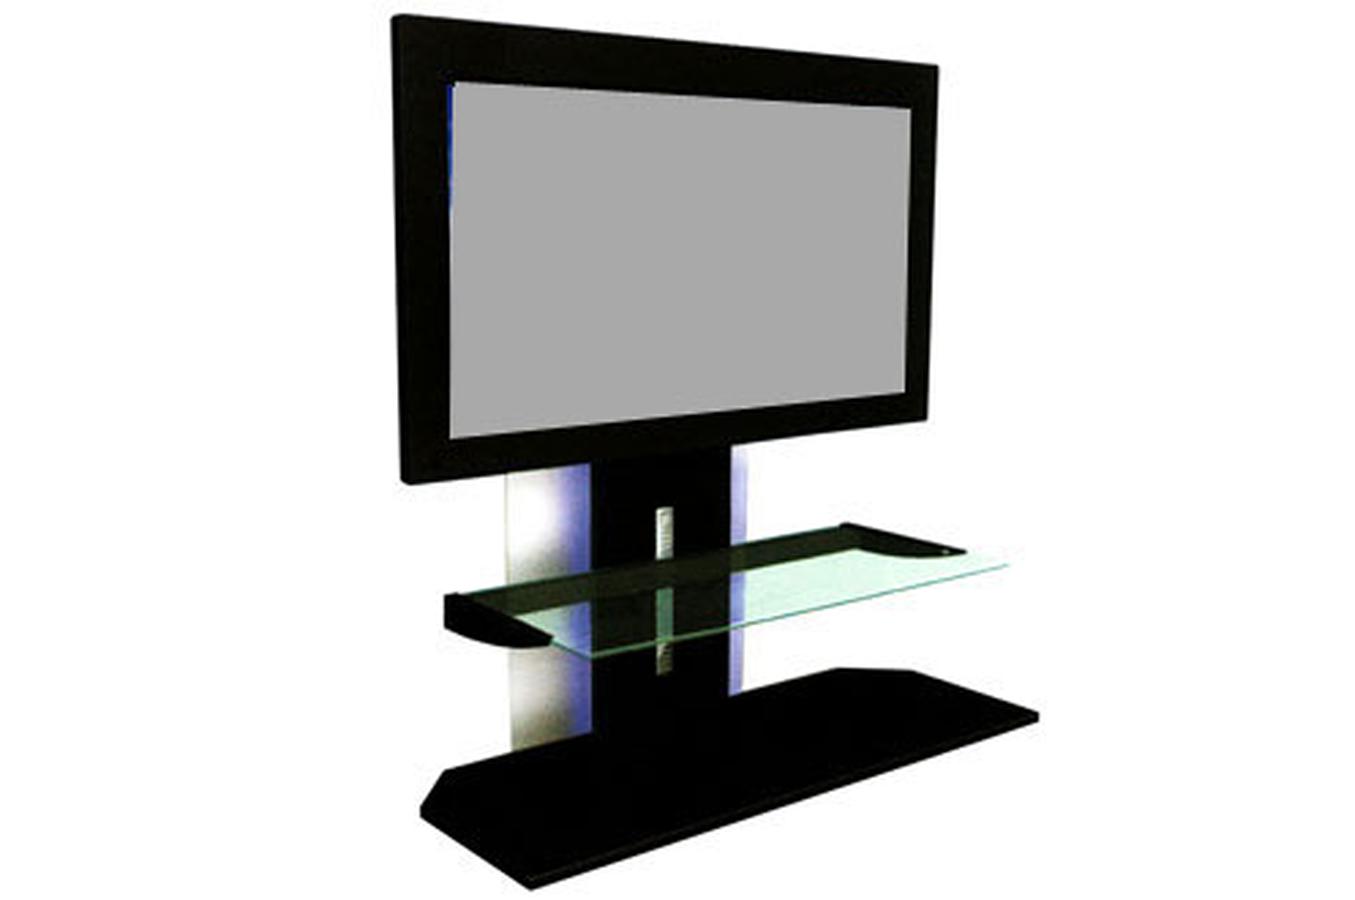 meuble tv erard 2529 potence nr verr 2383020 darty. Black Bedroom Furniture Sets. Home Design Ideas